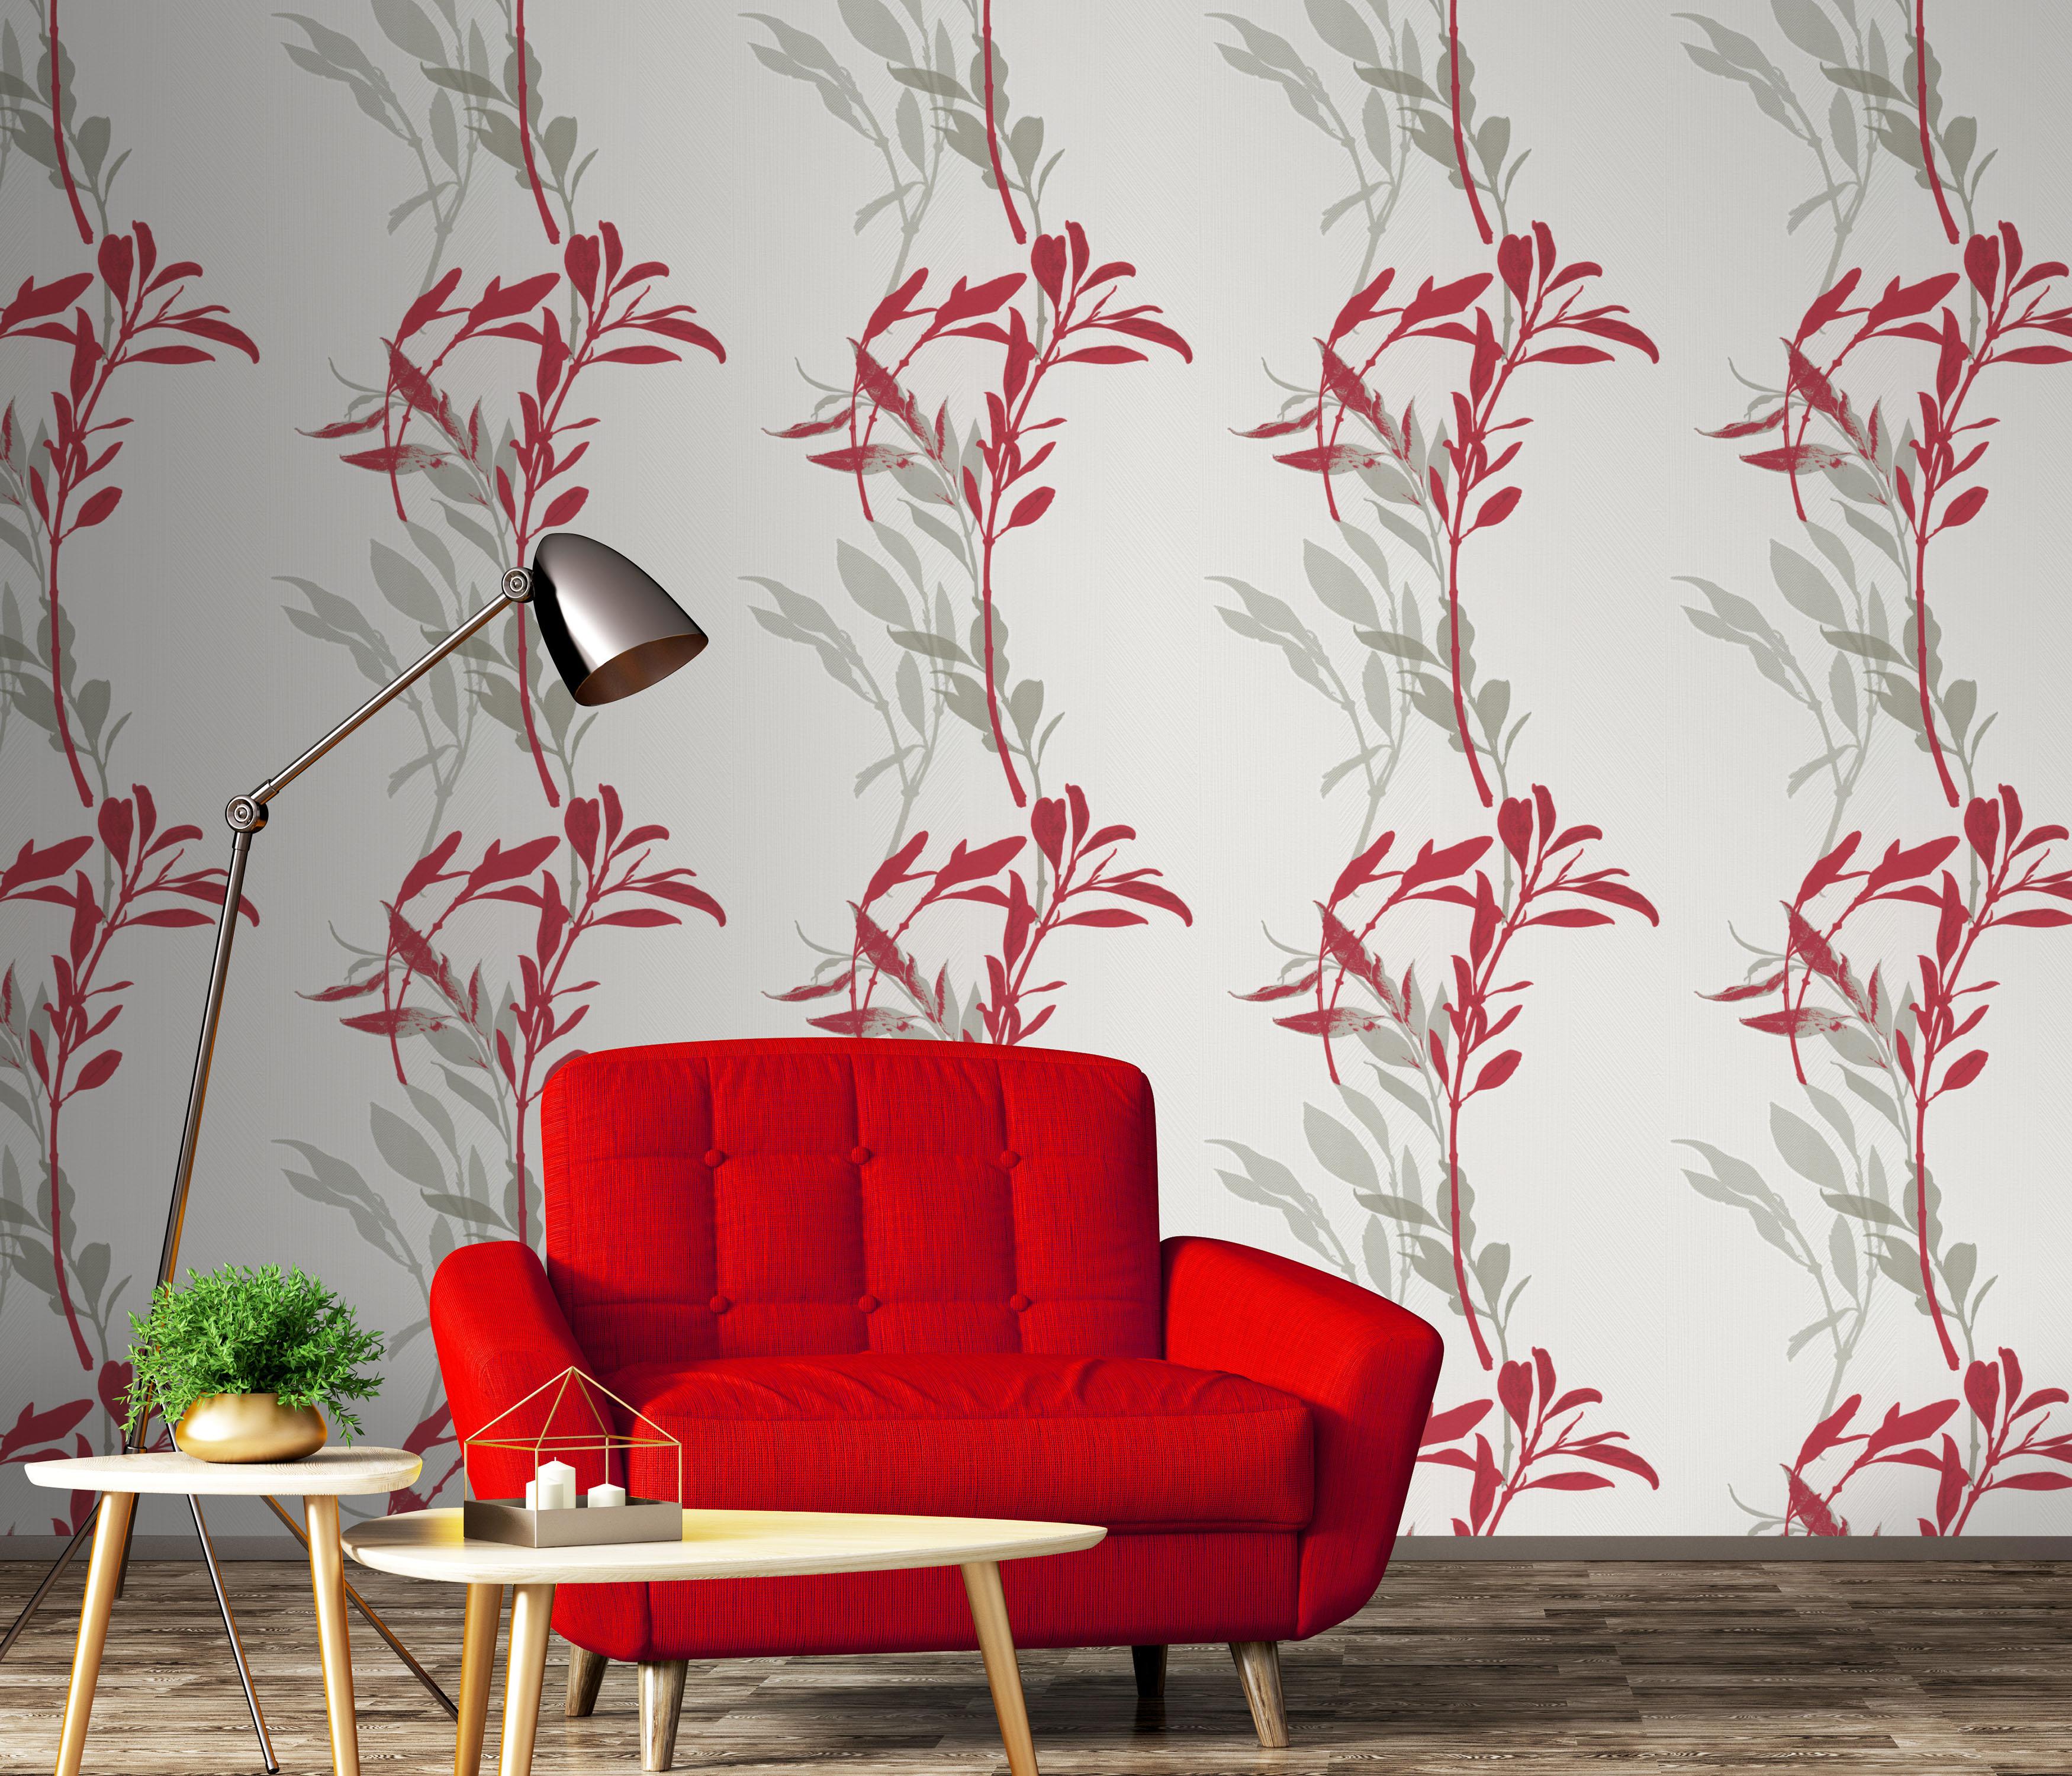 helle Vliestapete mit rotem Blumenmuster, roter Sessel